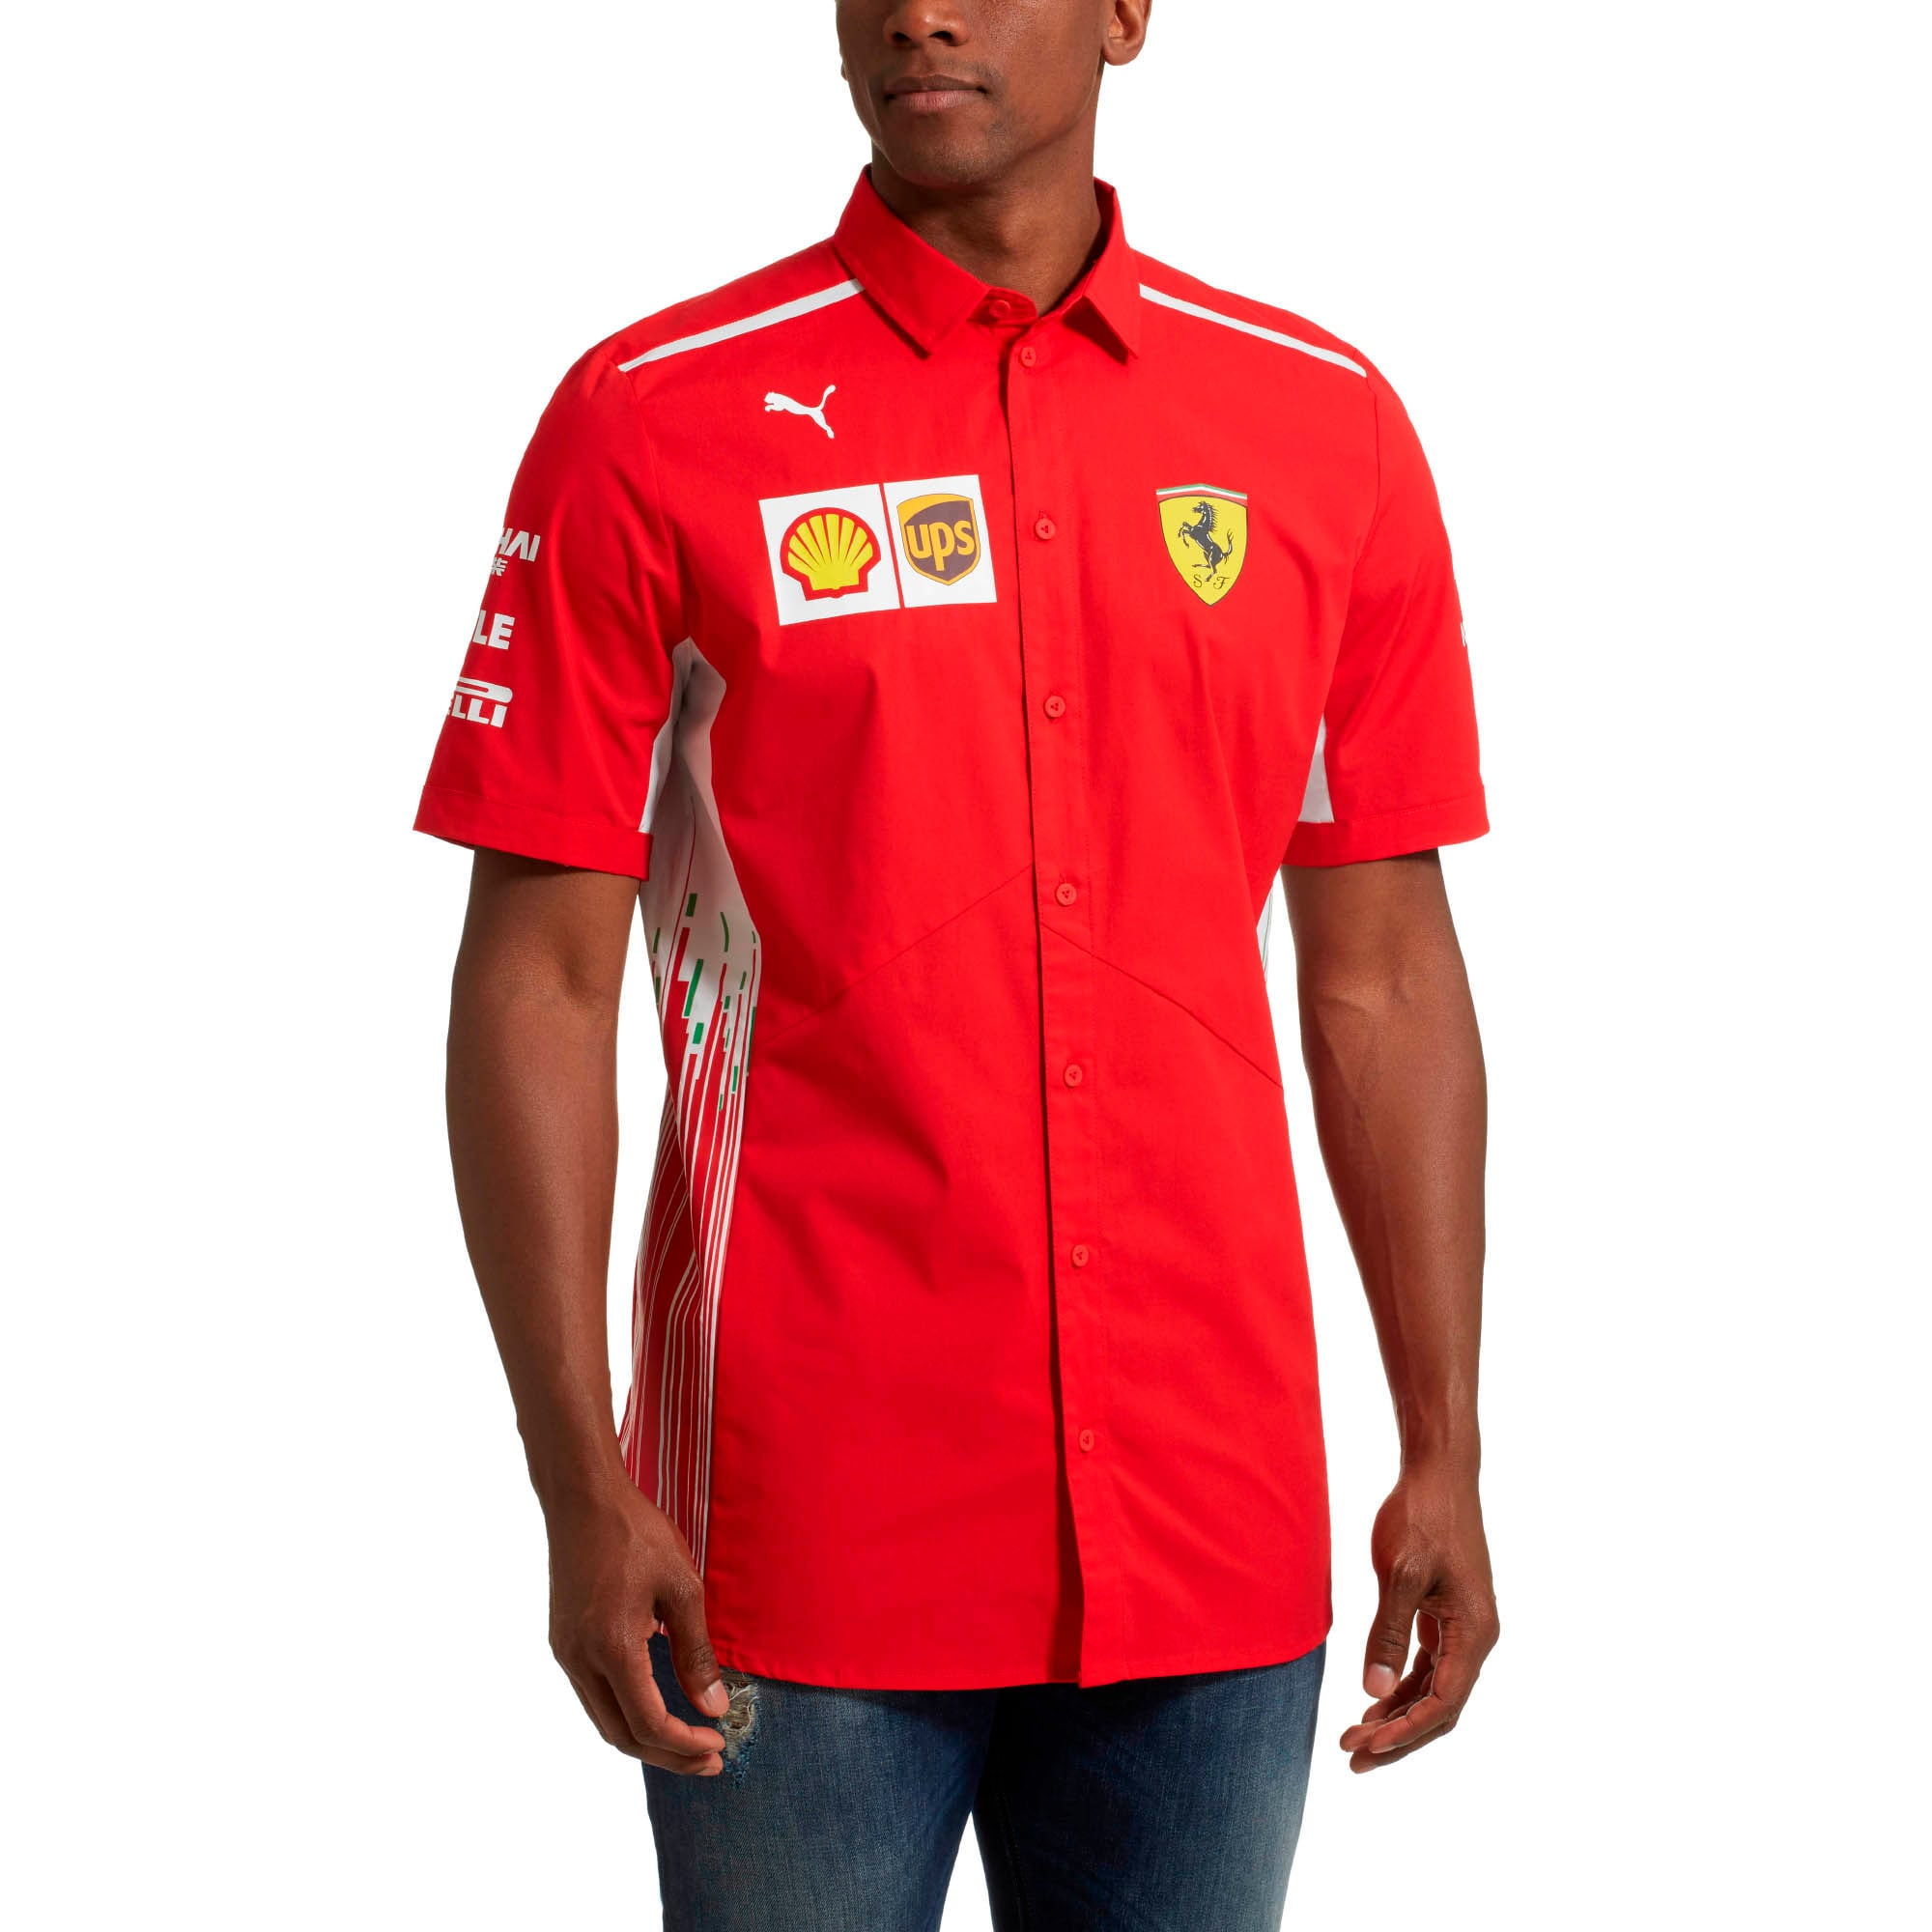 Thumbnail 2 of Scuderia Ferrari Men's Team Shirt, Rosso Corsa, medium